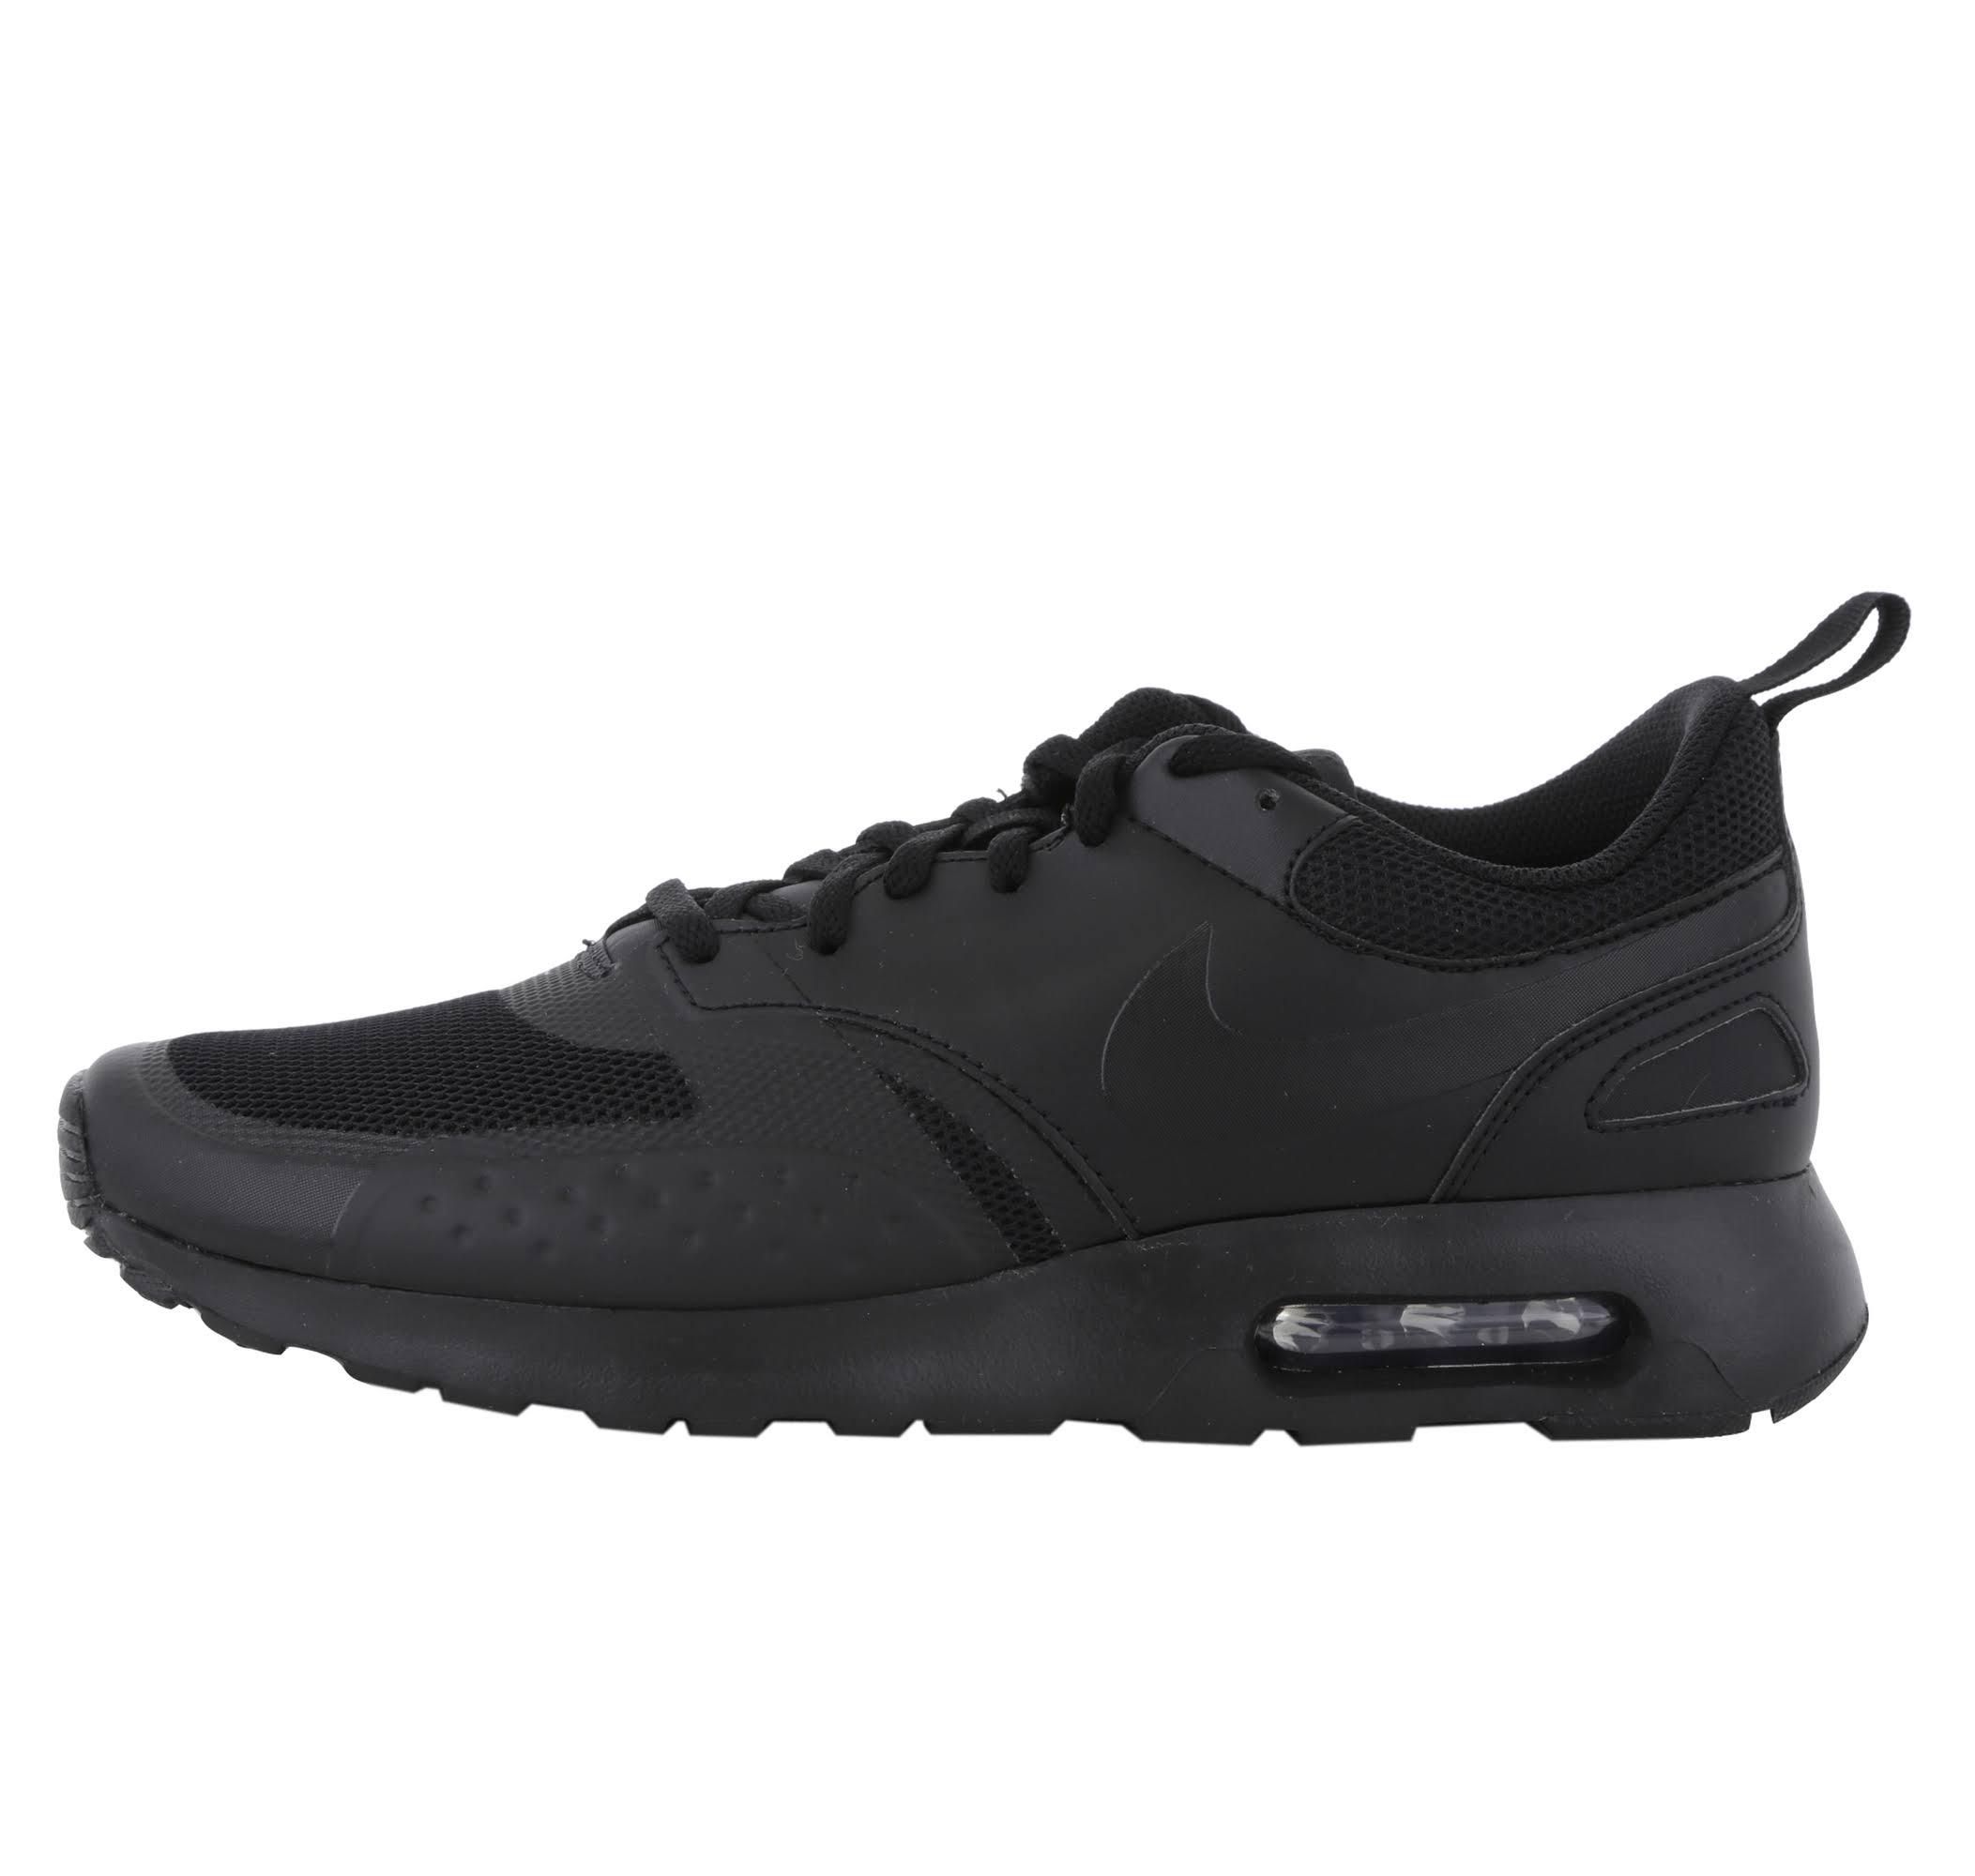 Air Vision Ayakkabı Nike 918230 Max Gümüş 001 Erkek Siyah Spor 44 Gri dggWZn